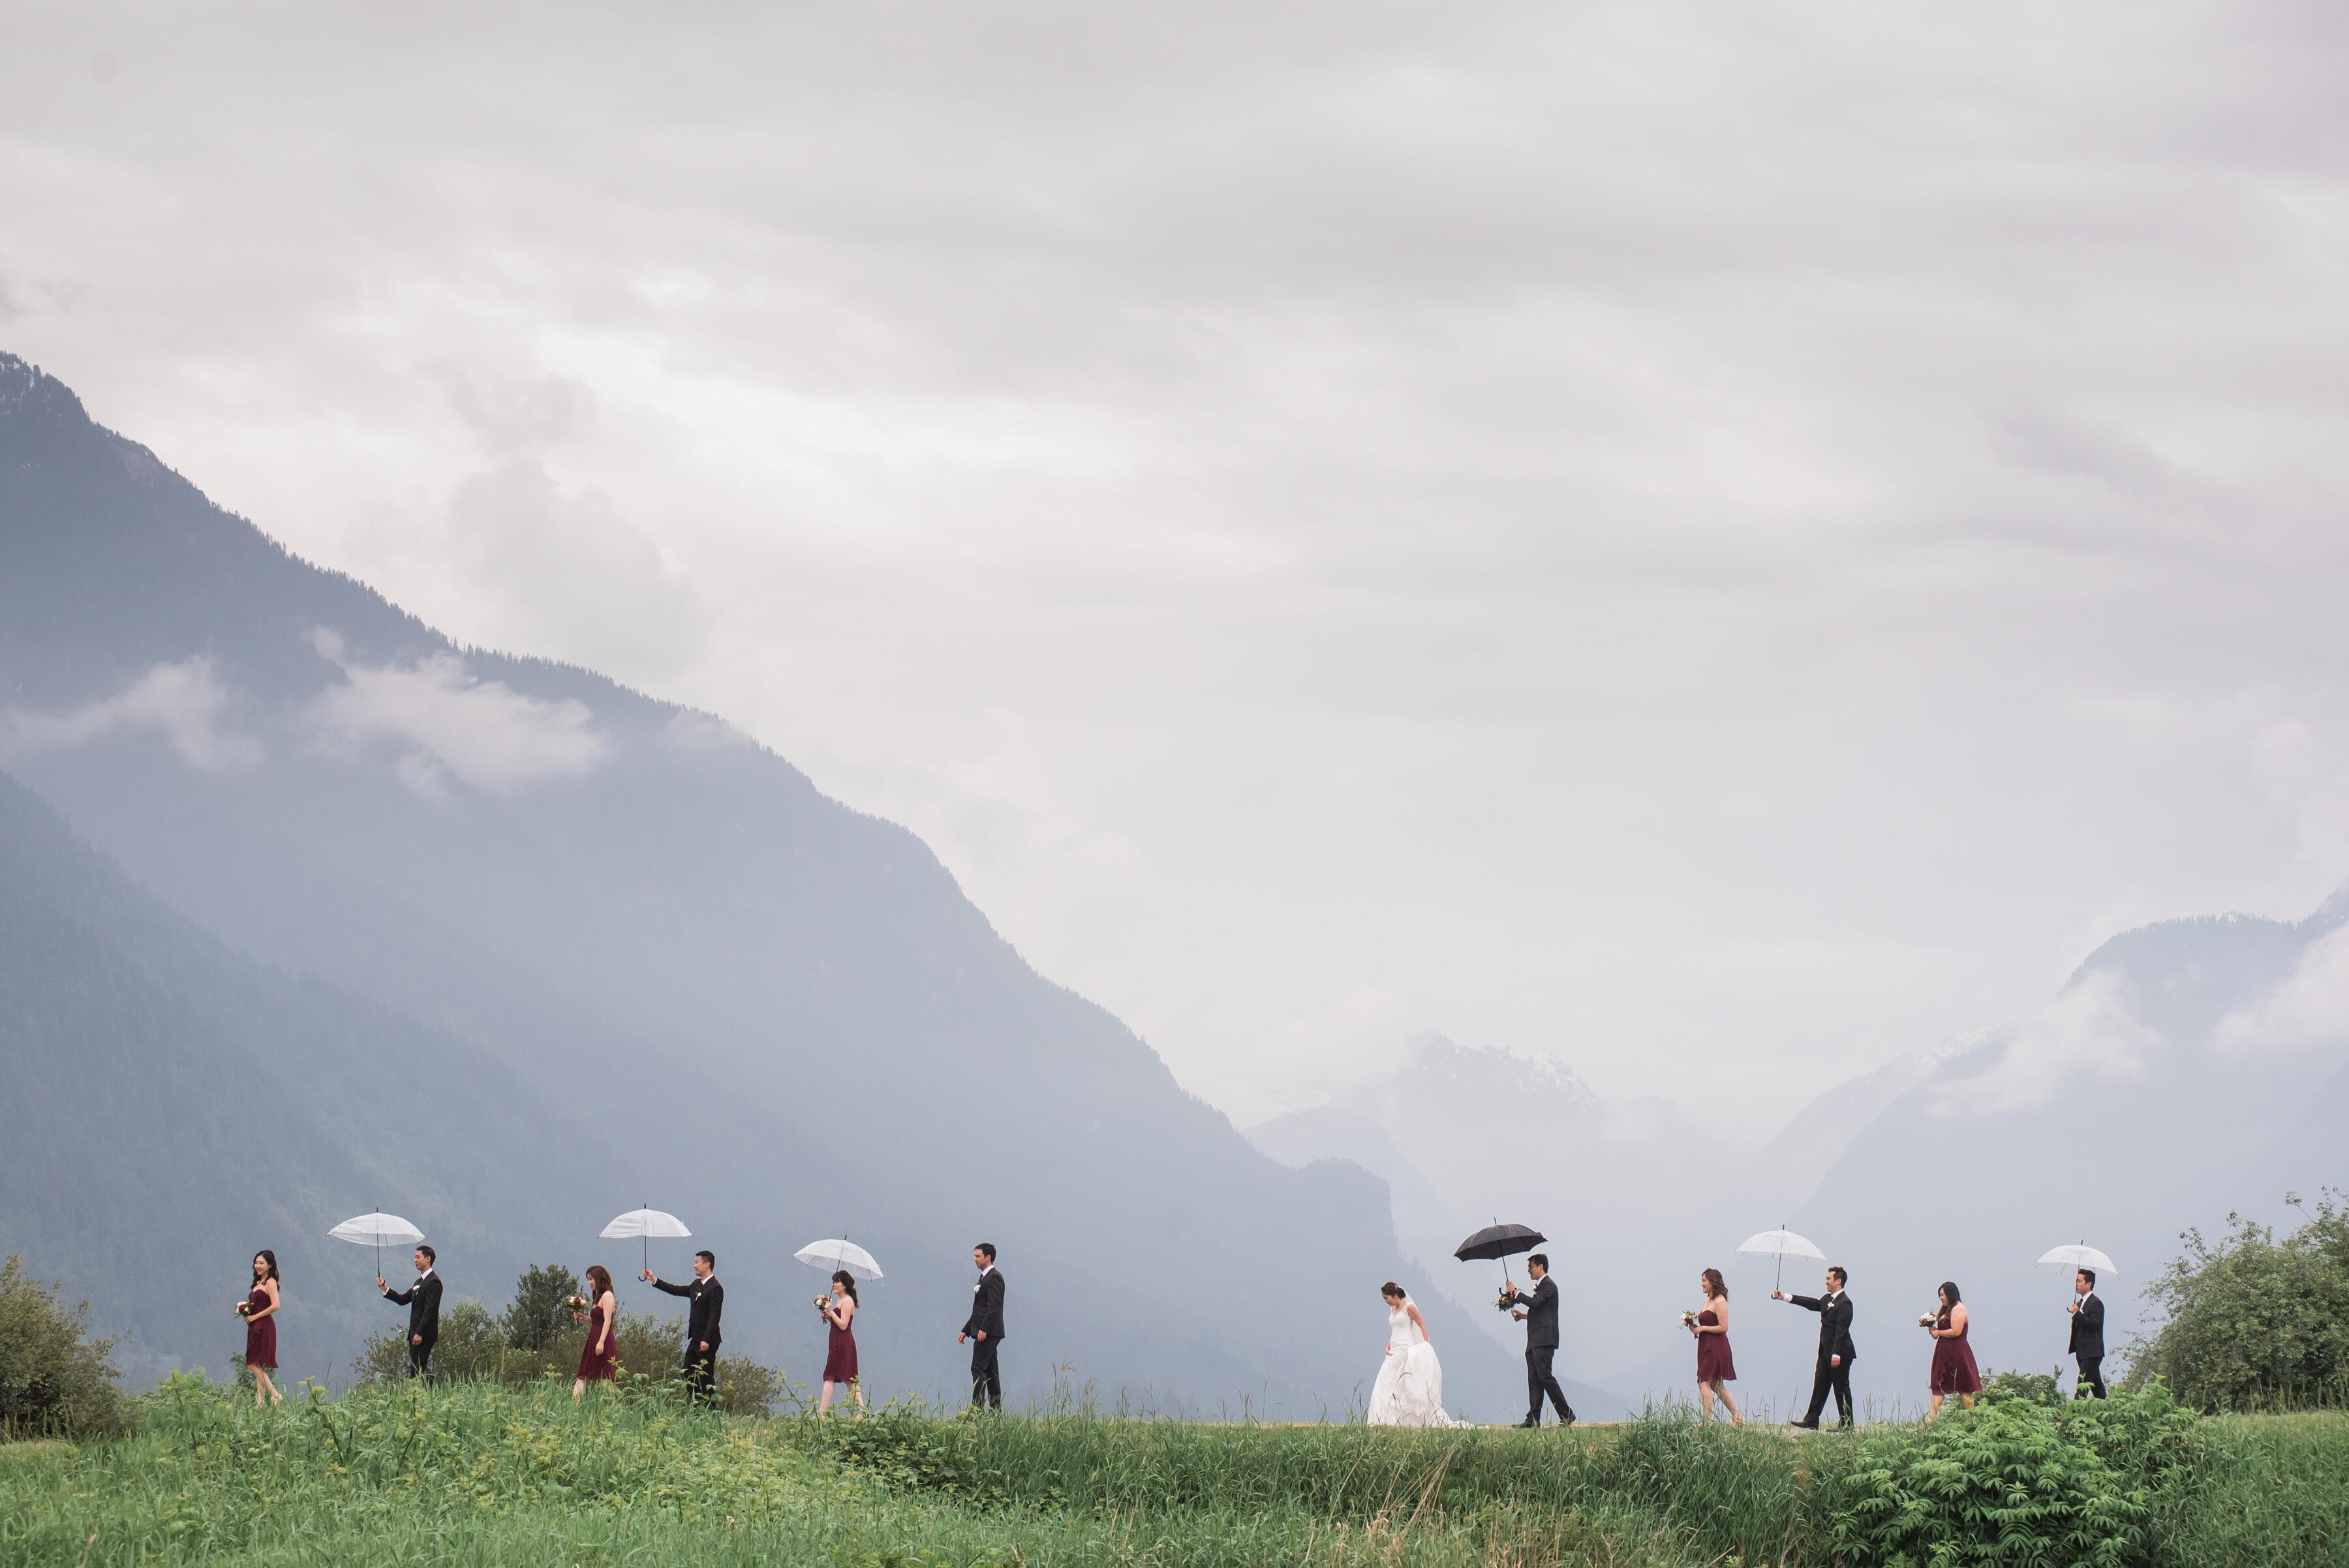 bridal party walking in rain with umbrellas